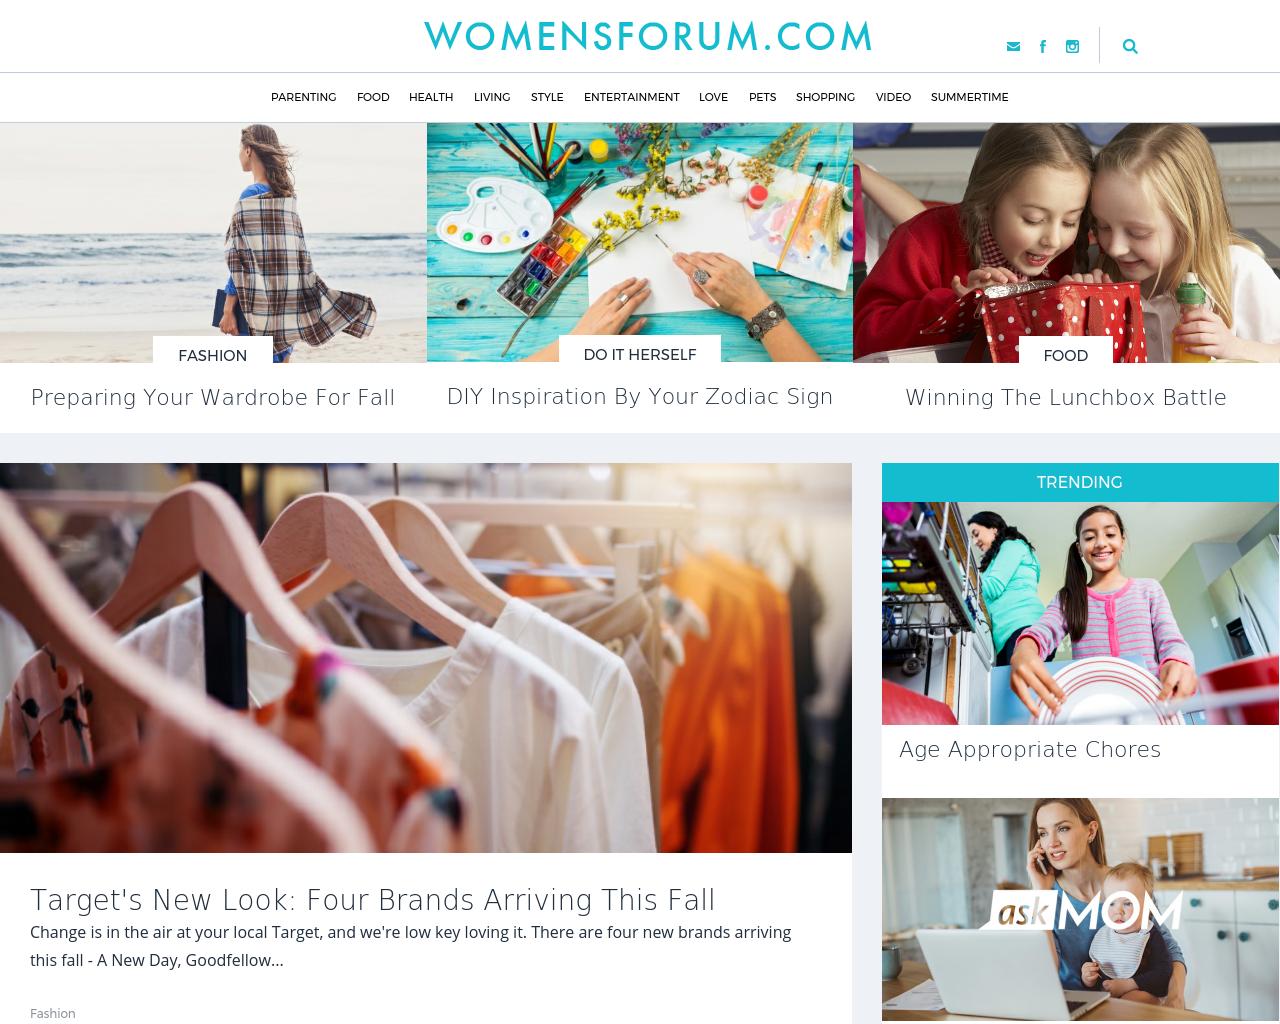 Womens-Forum-Advertising-Reviews-Pricing